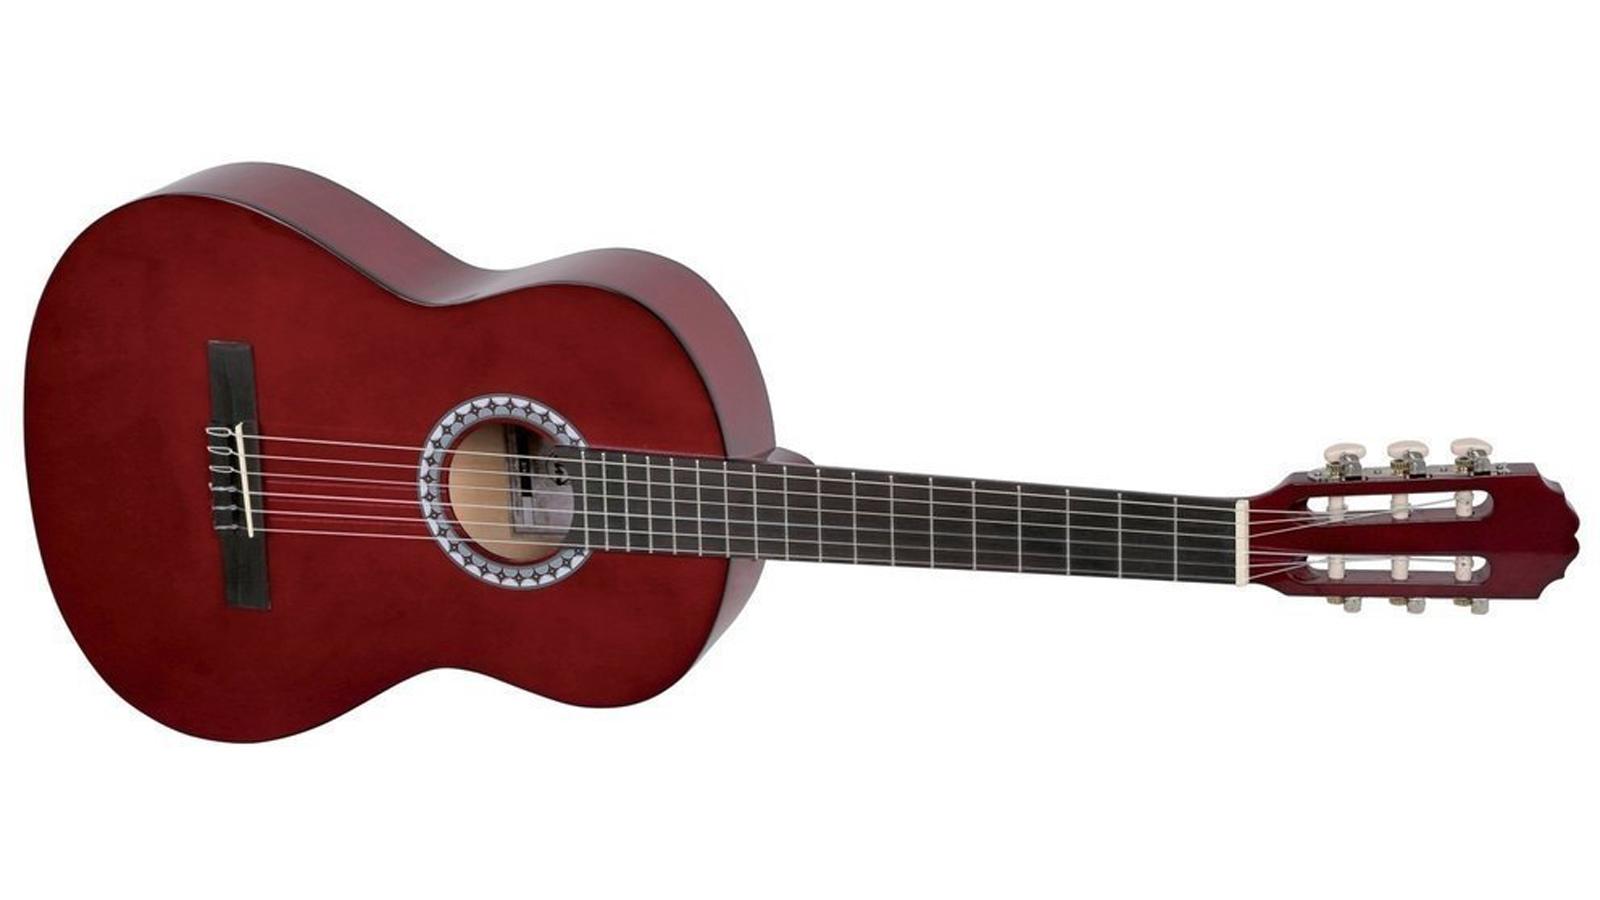 VGS Konzertgitarre 4/4 Rot Basic